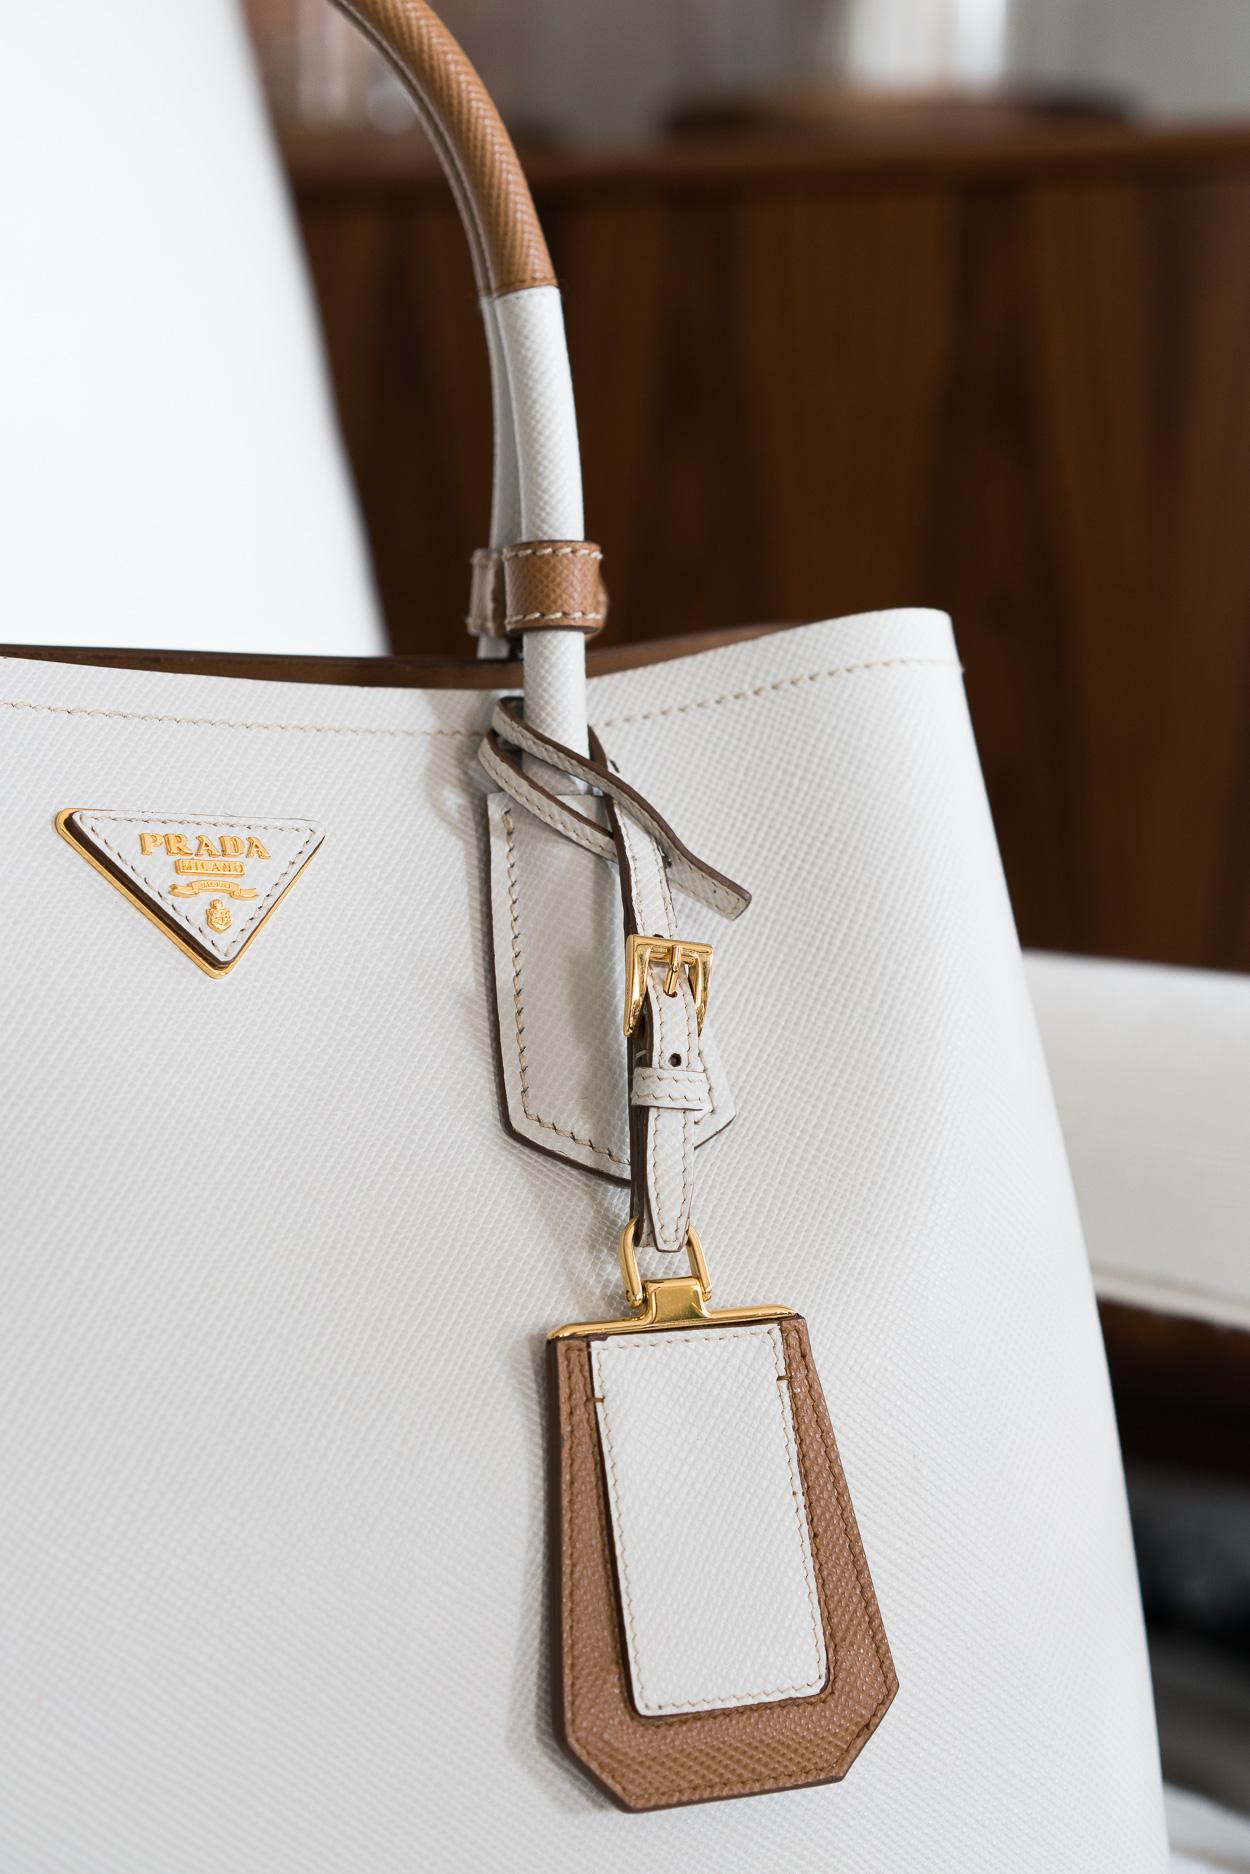 Prada Bicolor Double Bag (4)